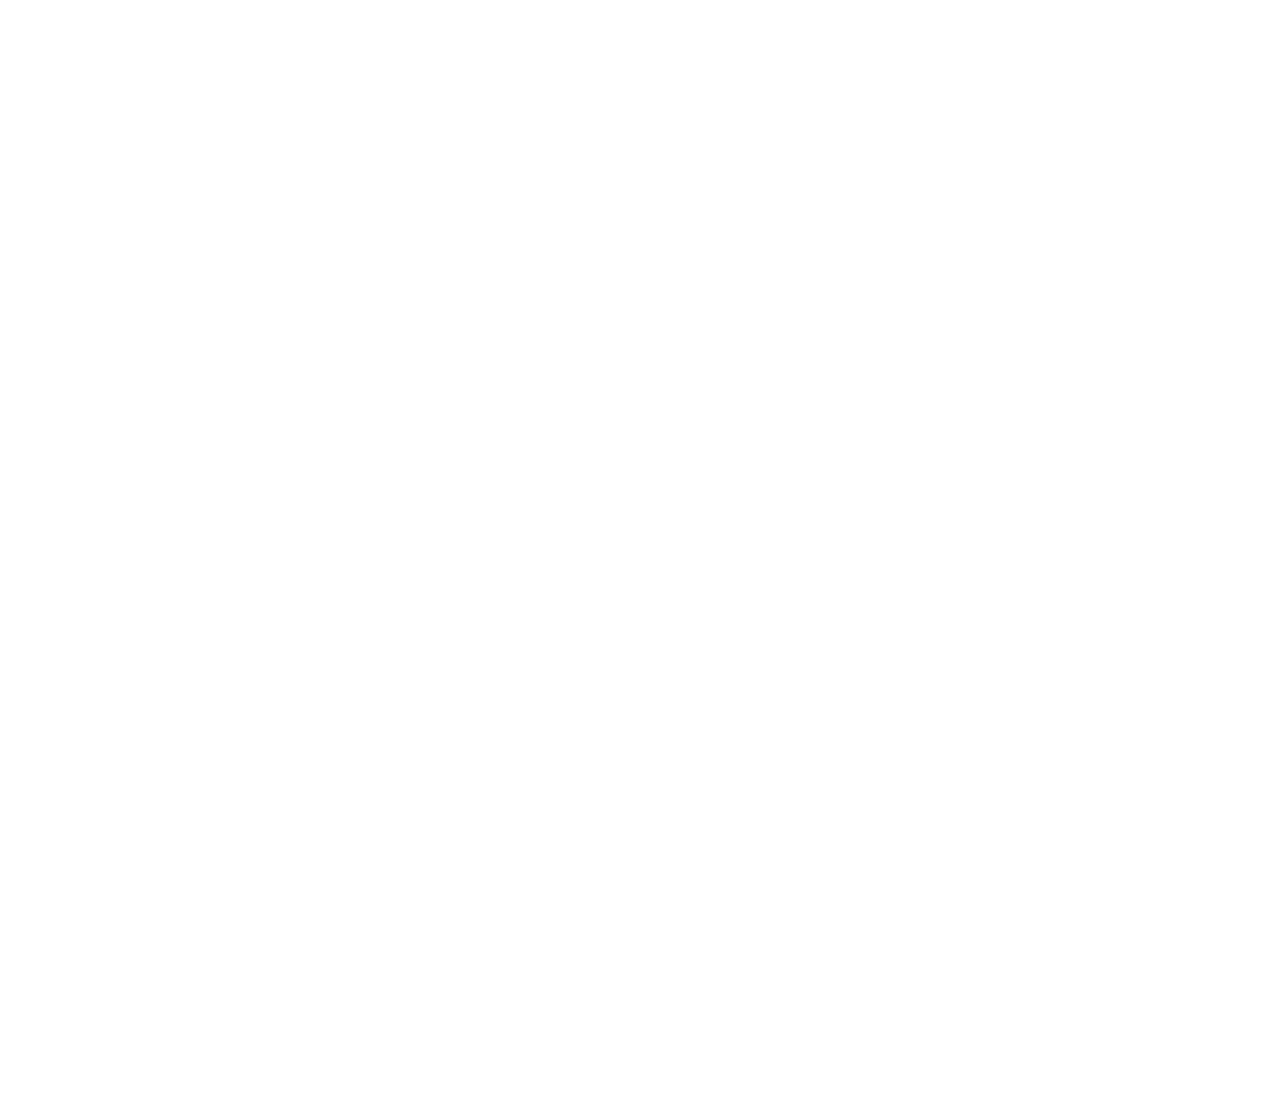 Anchored-Circle-White.png